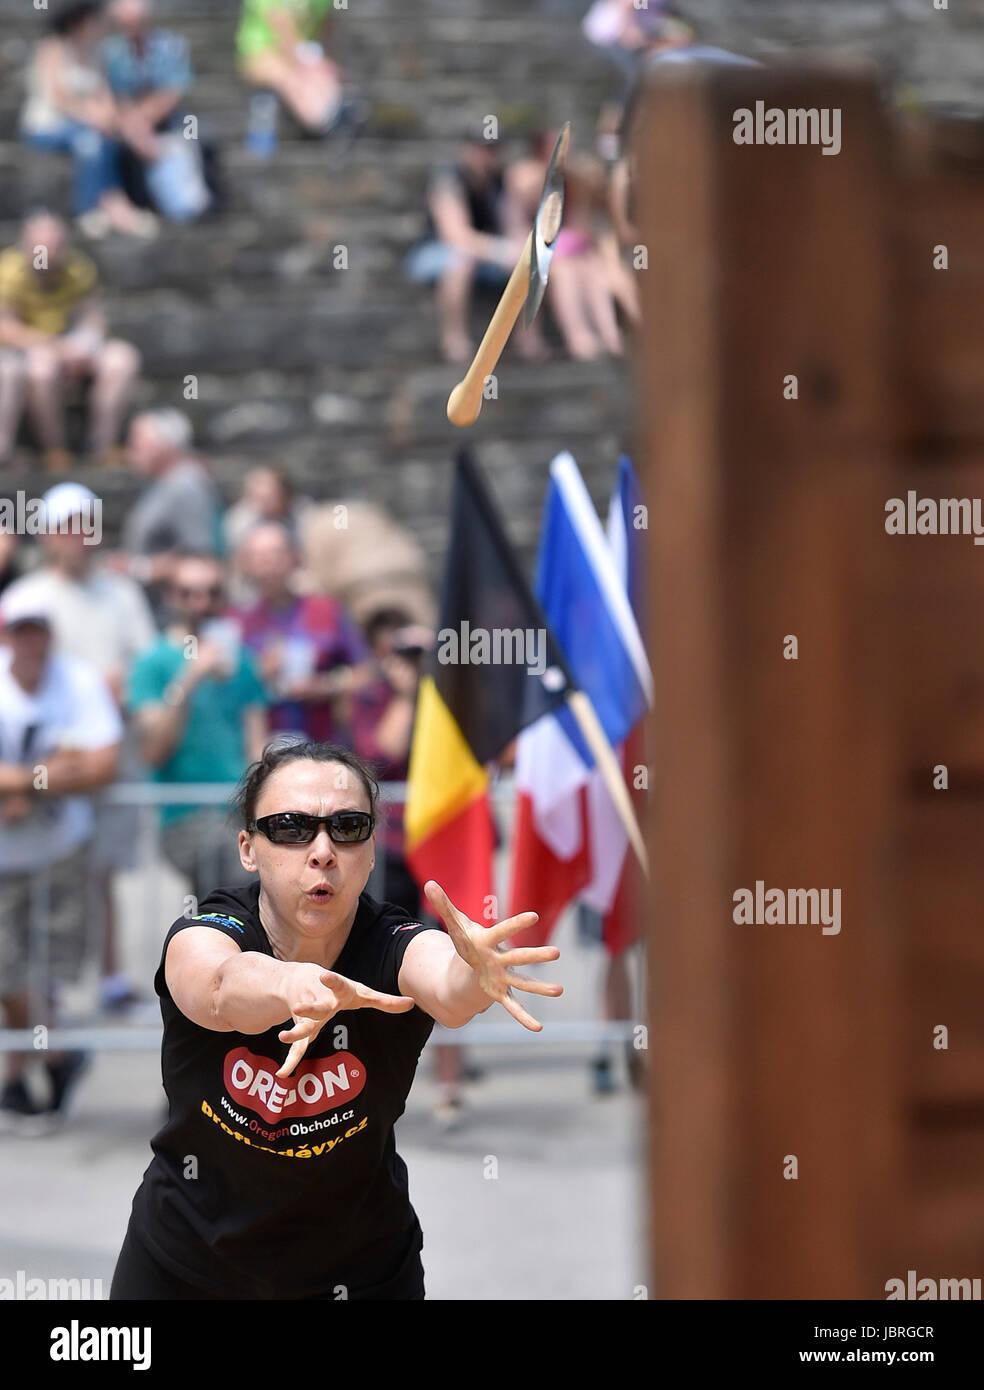 Jihlava, Czech Republic. 11th June, 2017. German Svenja Bauer in action during Axe throw Eurojack 2017 international - Stock Image